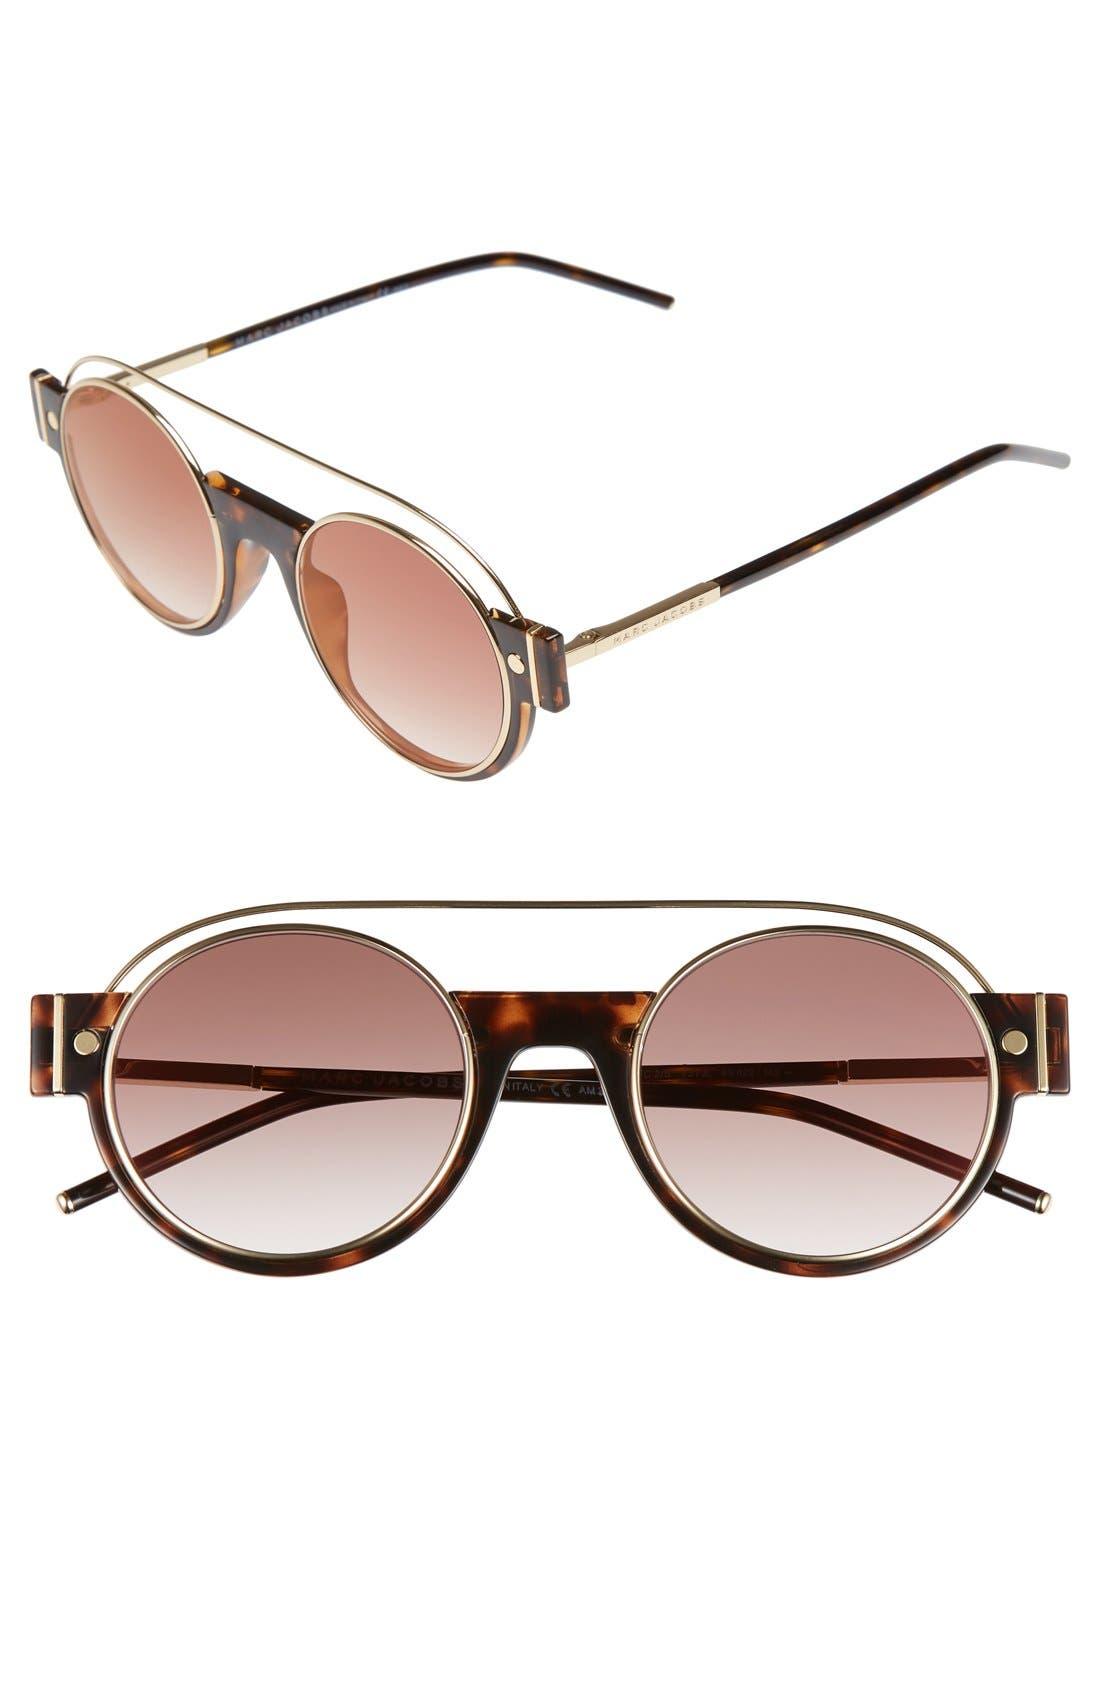 49mm Round Sunglasses,                         Main,                         color, Dark Havana